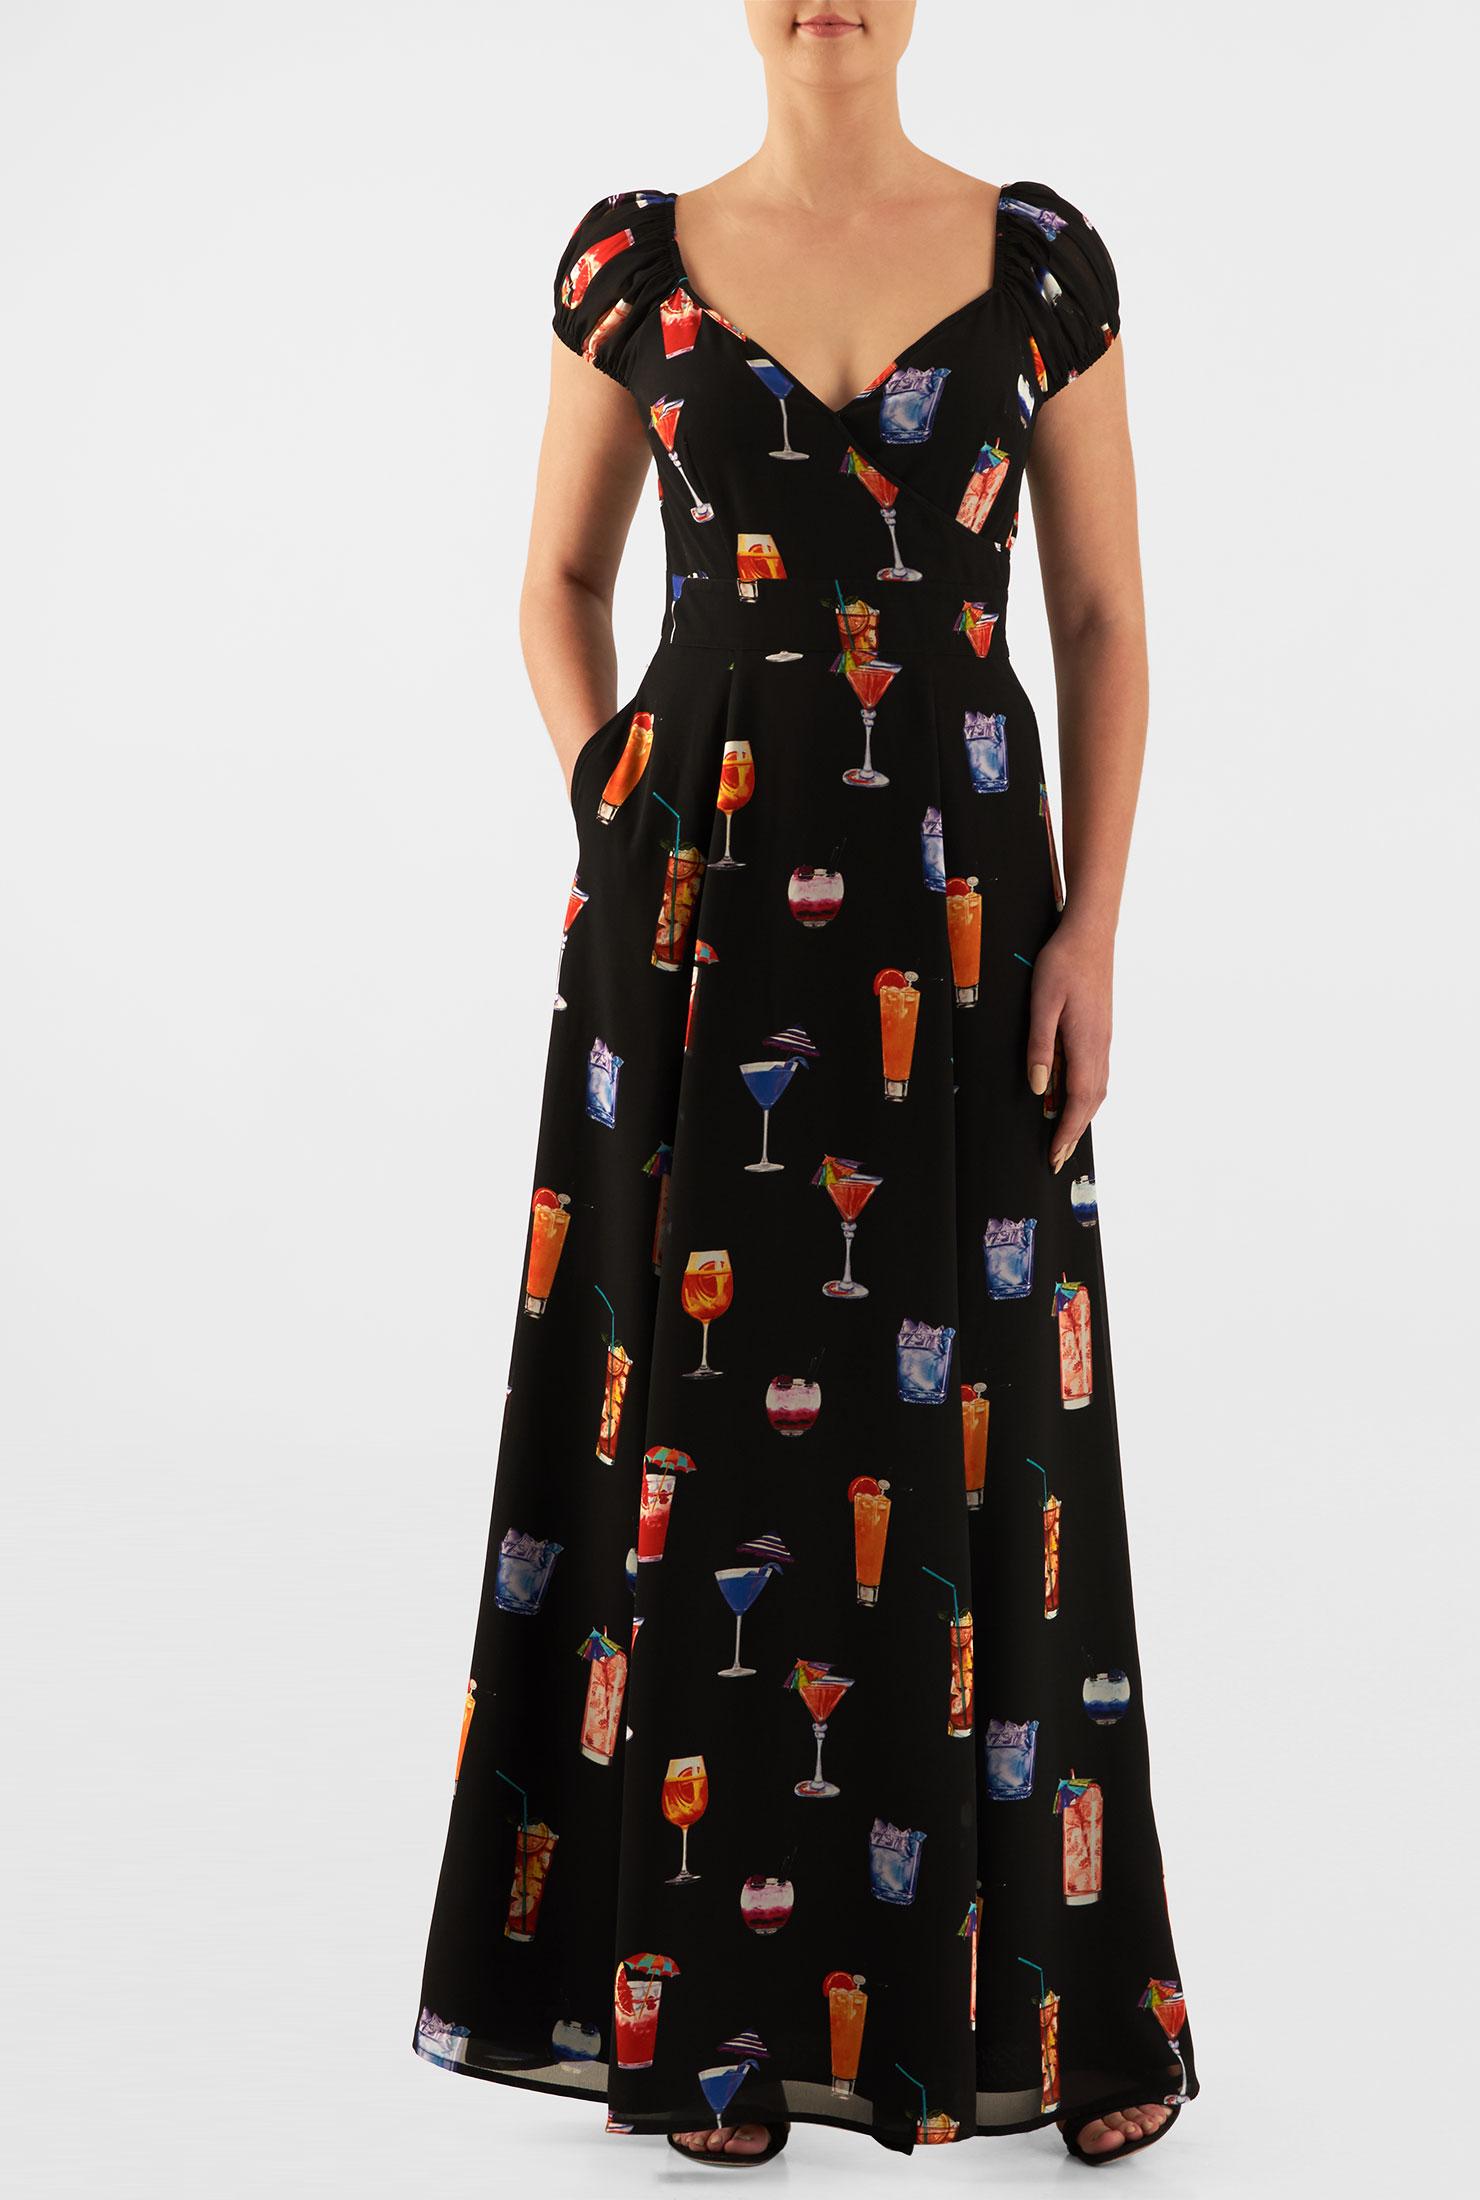 Eshakti Womens Wine Cooler Print Georgette Surplice Maxi Dress